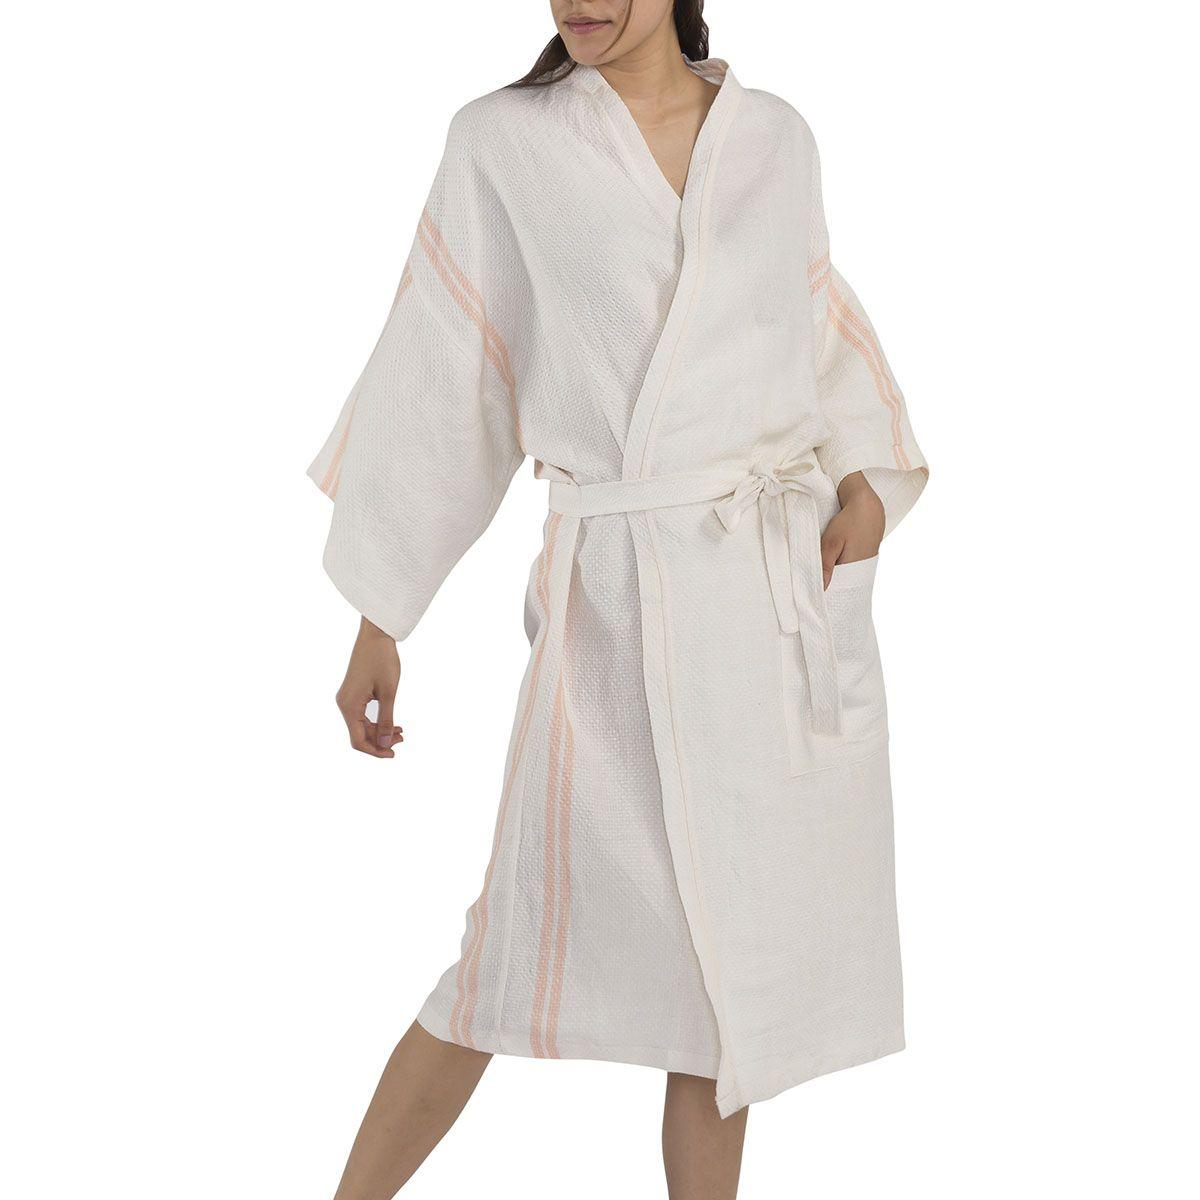 Bathrobe - Dressing Gown Honeycombed - Ecru / Melon Stripes